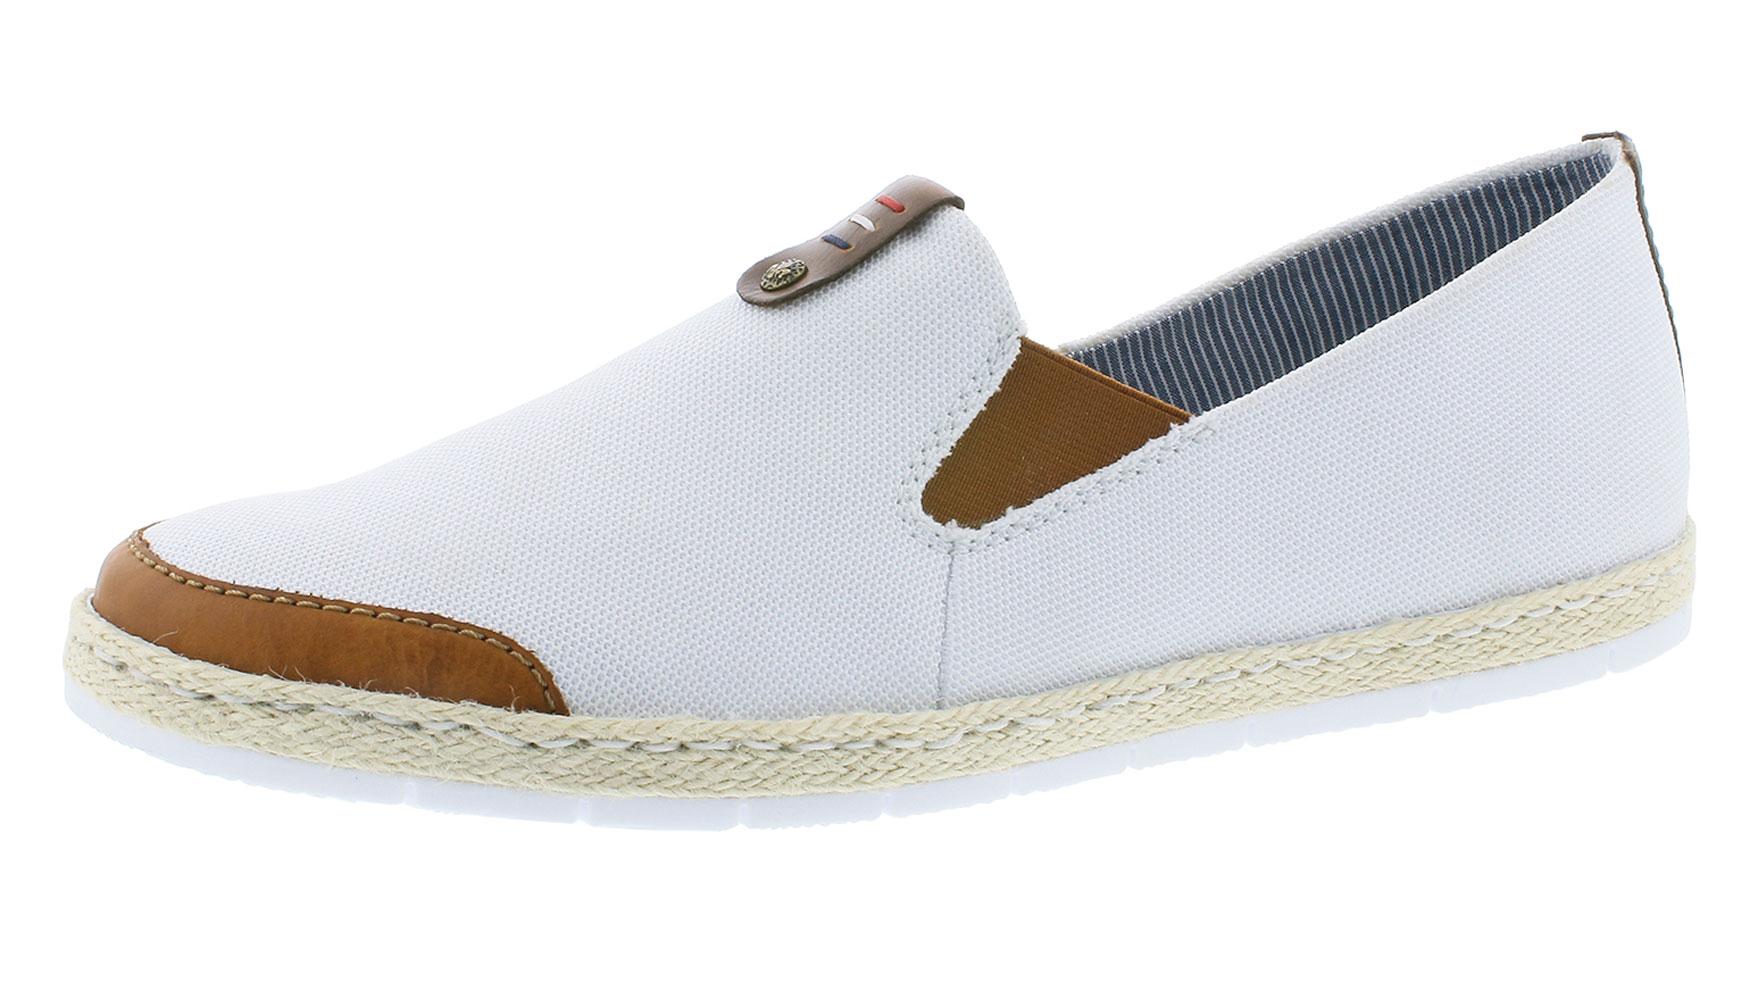 2cd4b74c9cbcbb Rieker M2654-24 Damen Halbschuhe Sneaker Slipper weiß 001